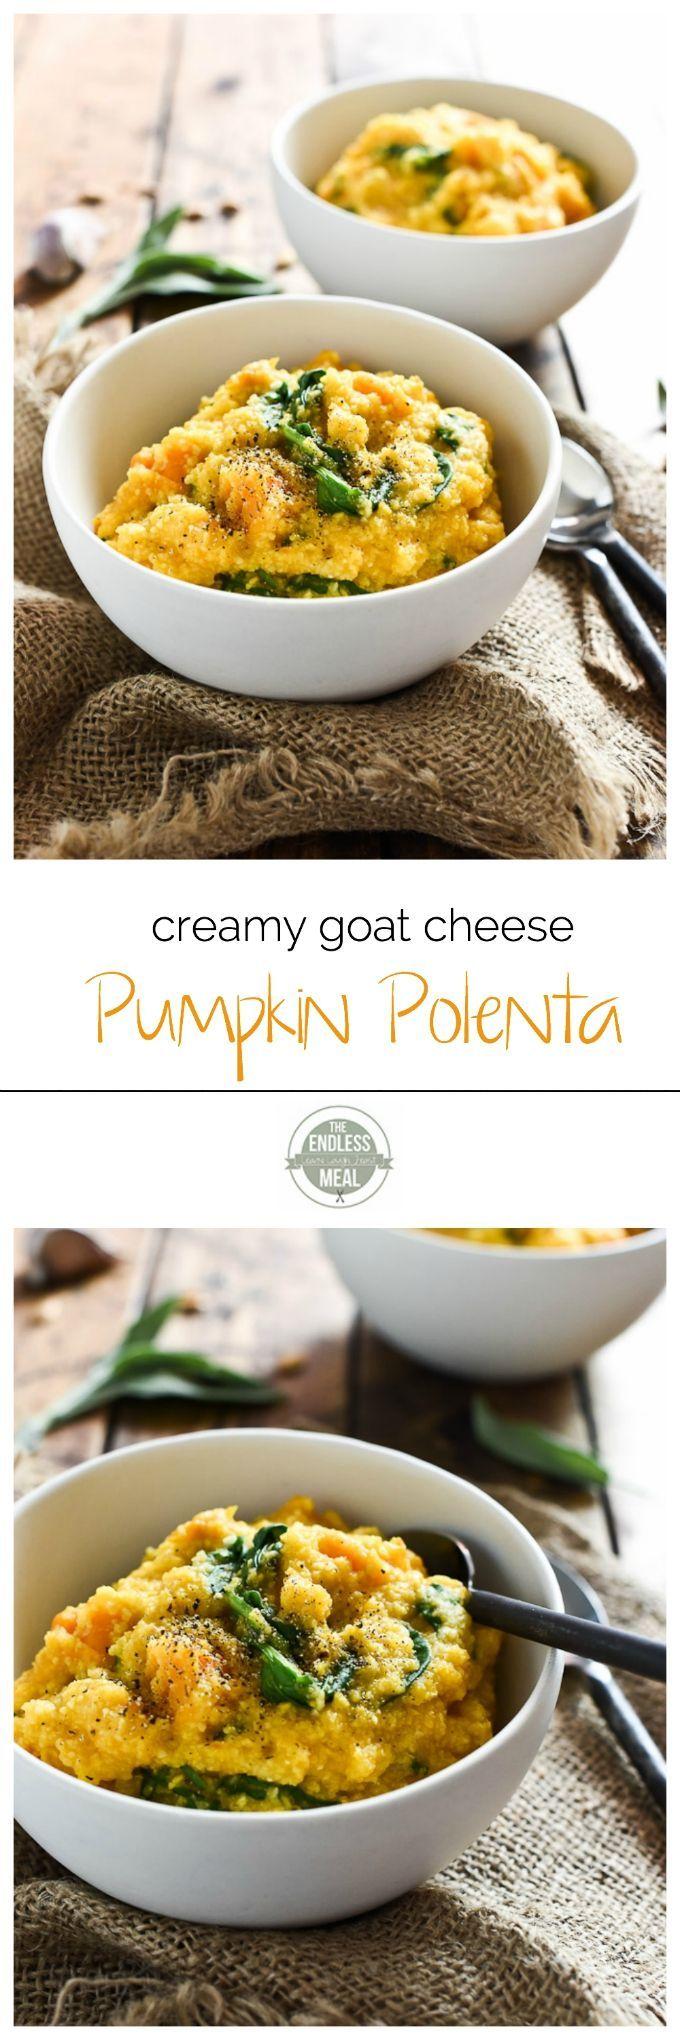 Creamy Goat Cheese & Pumpkin Polenta | The Endless Meal